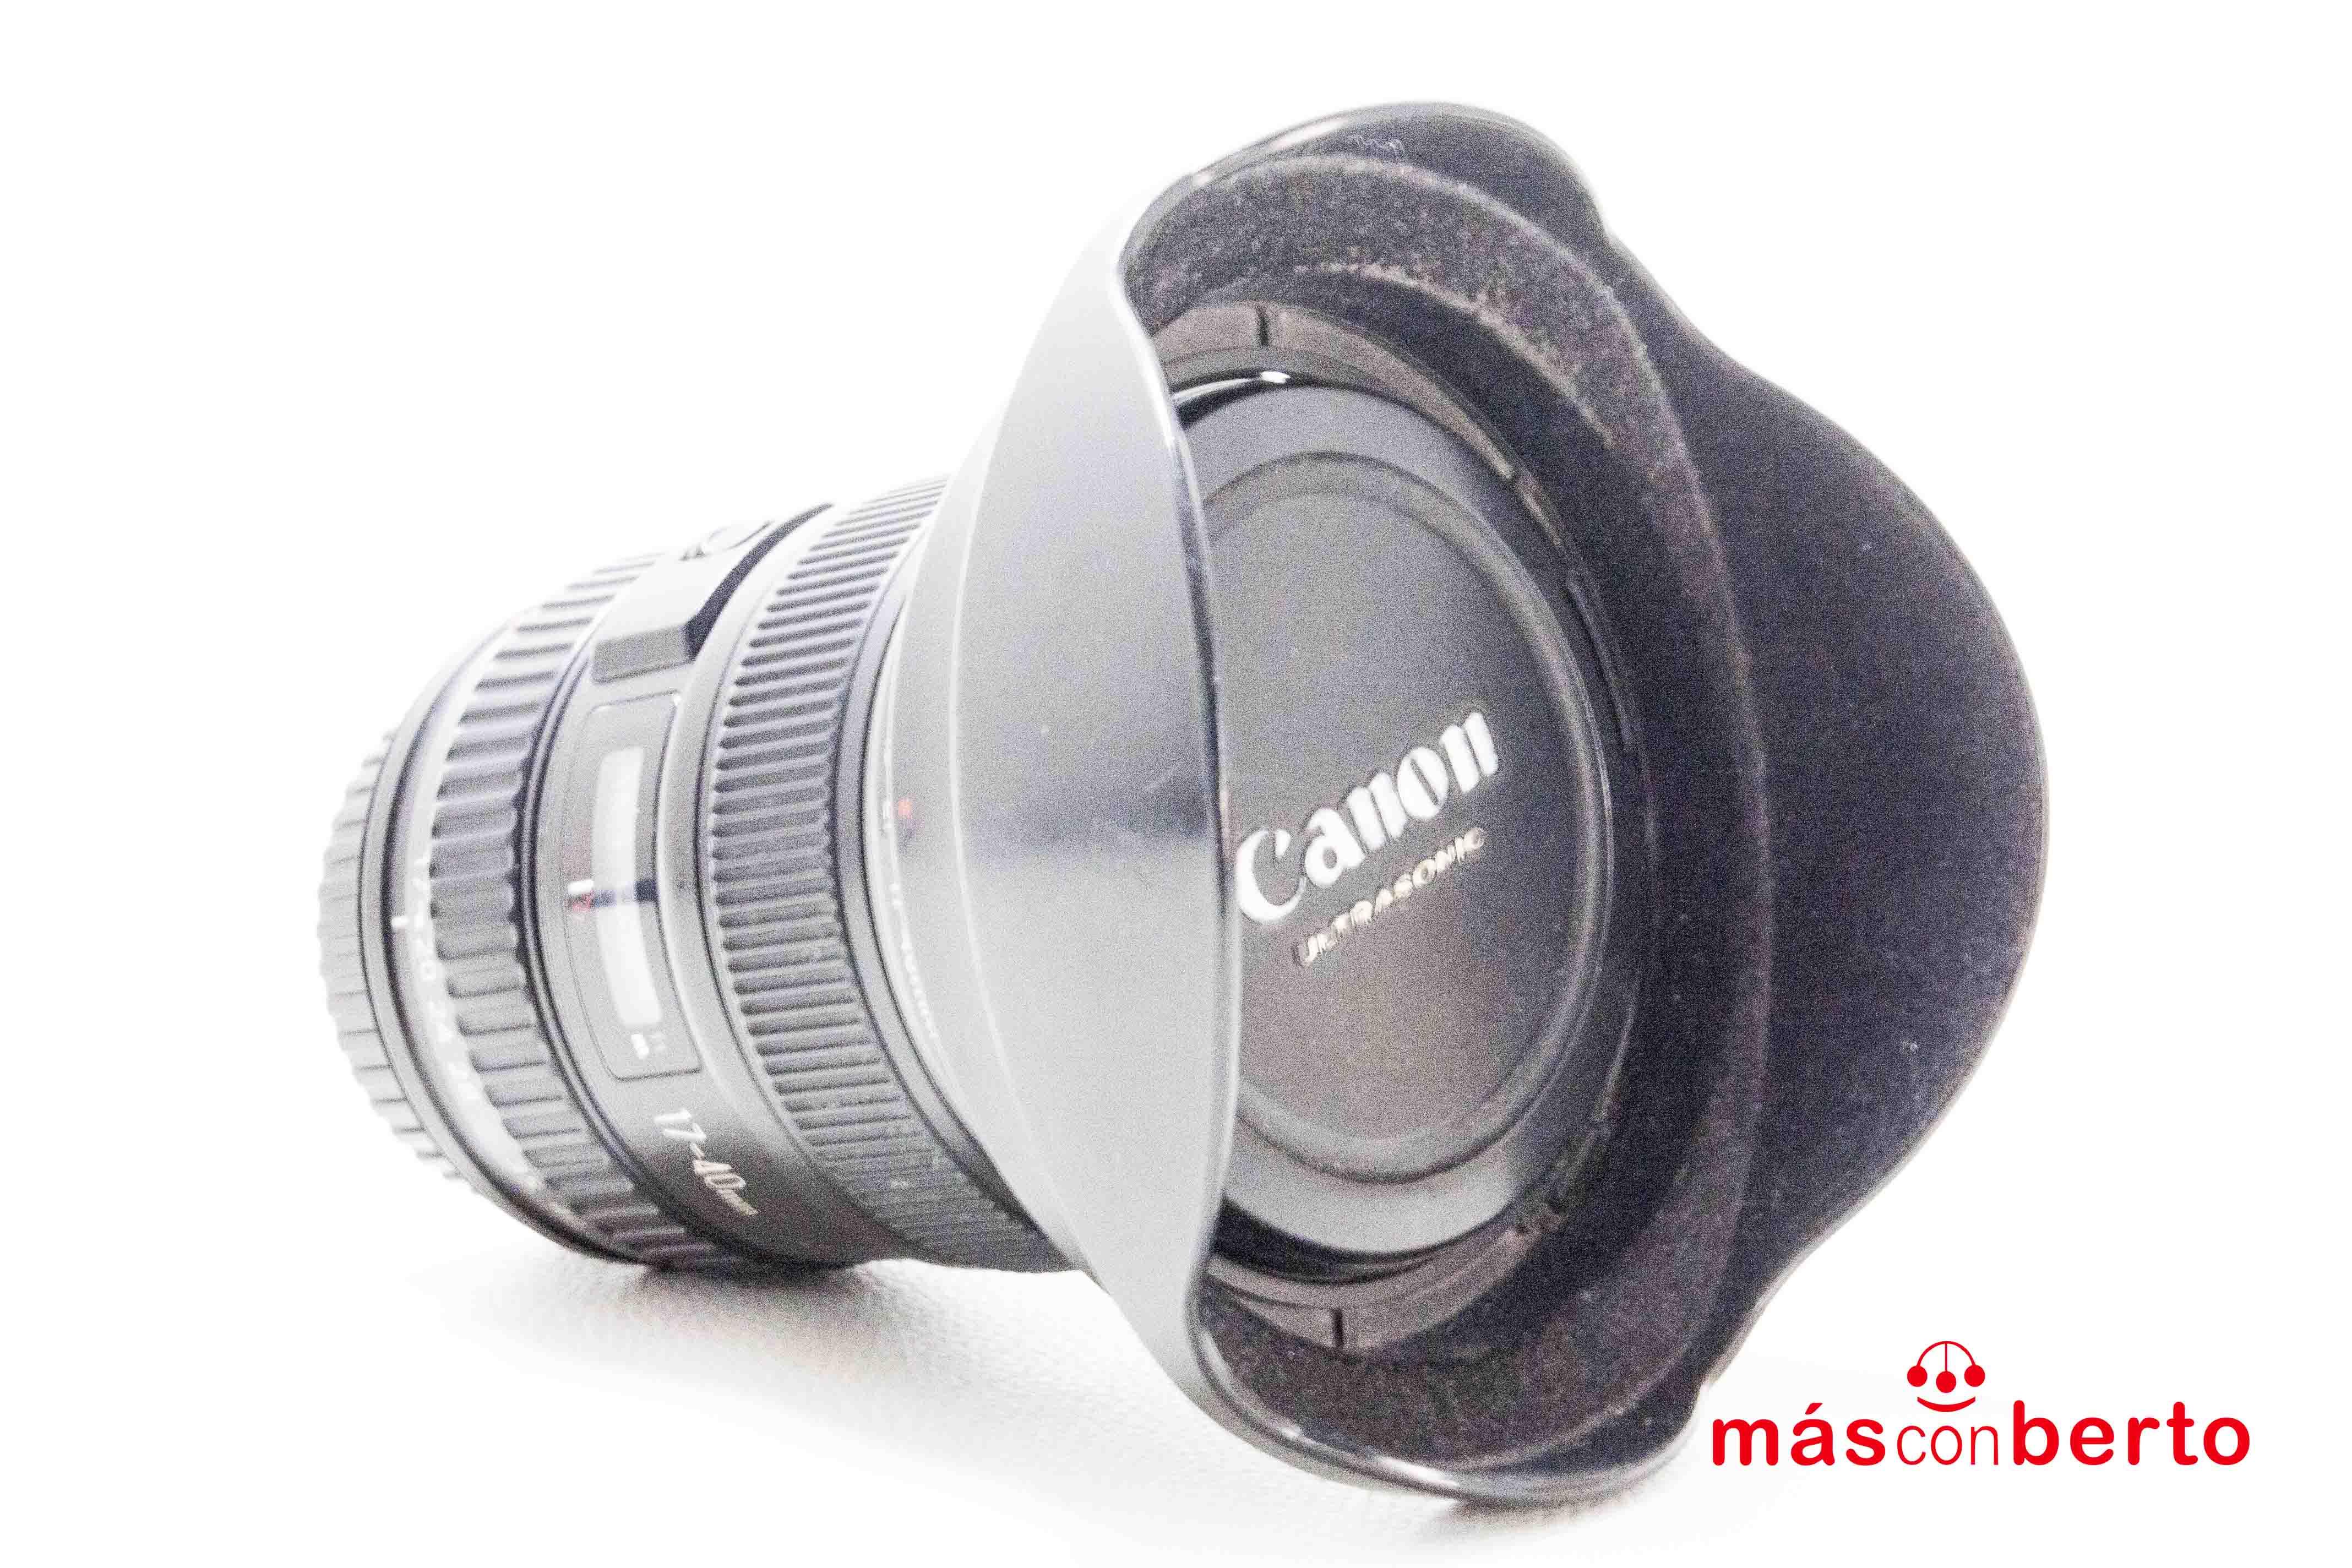 Objetivo canon 17-40mm 1.4L